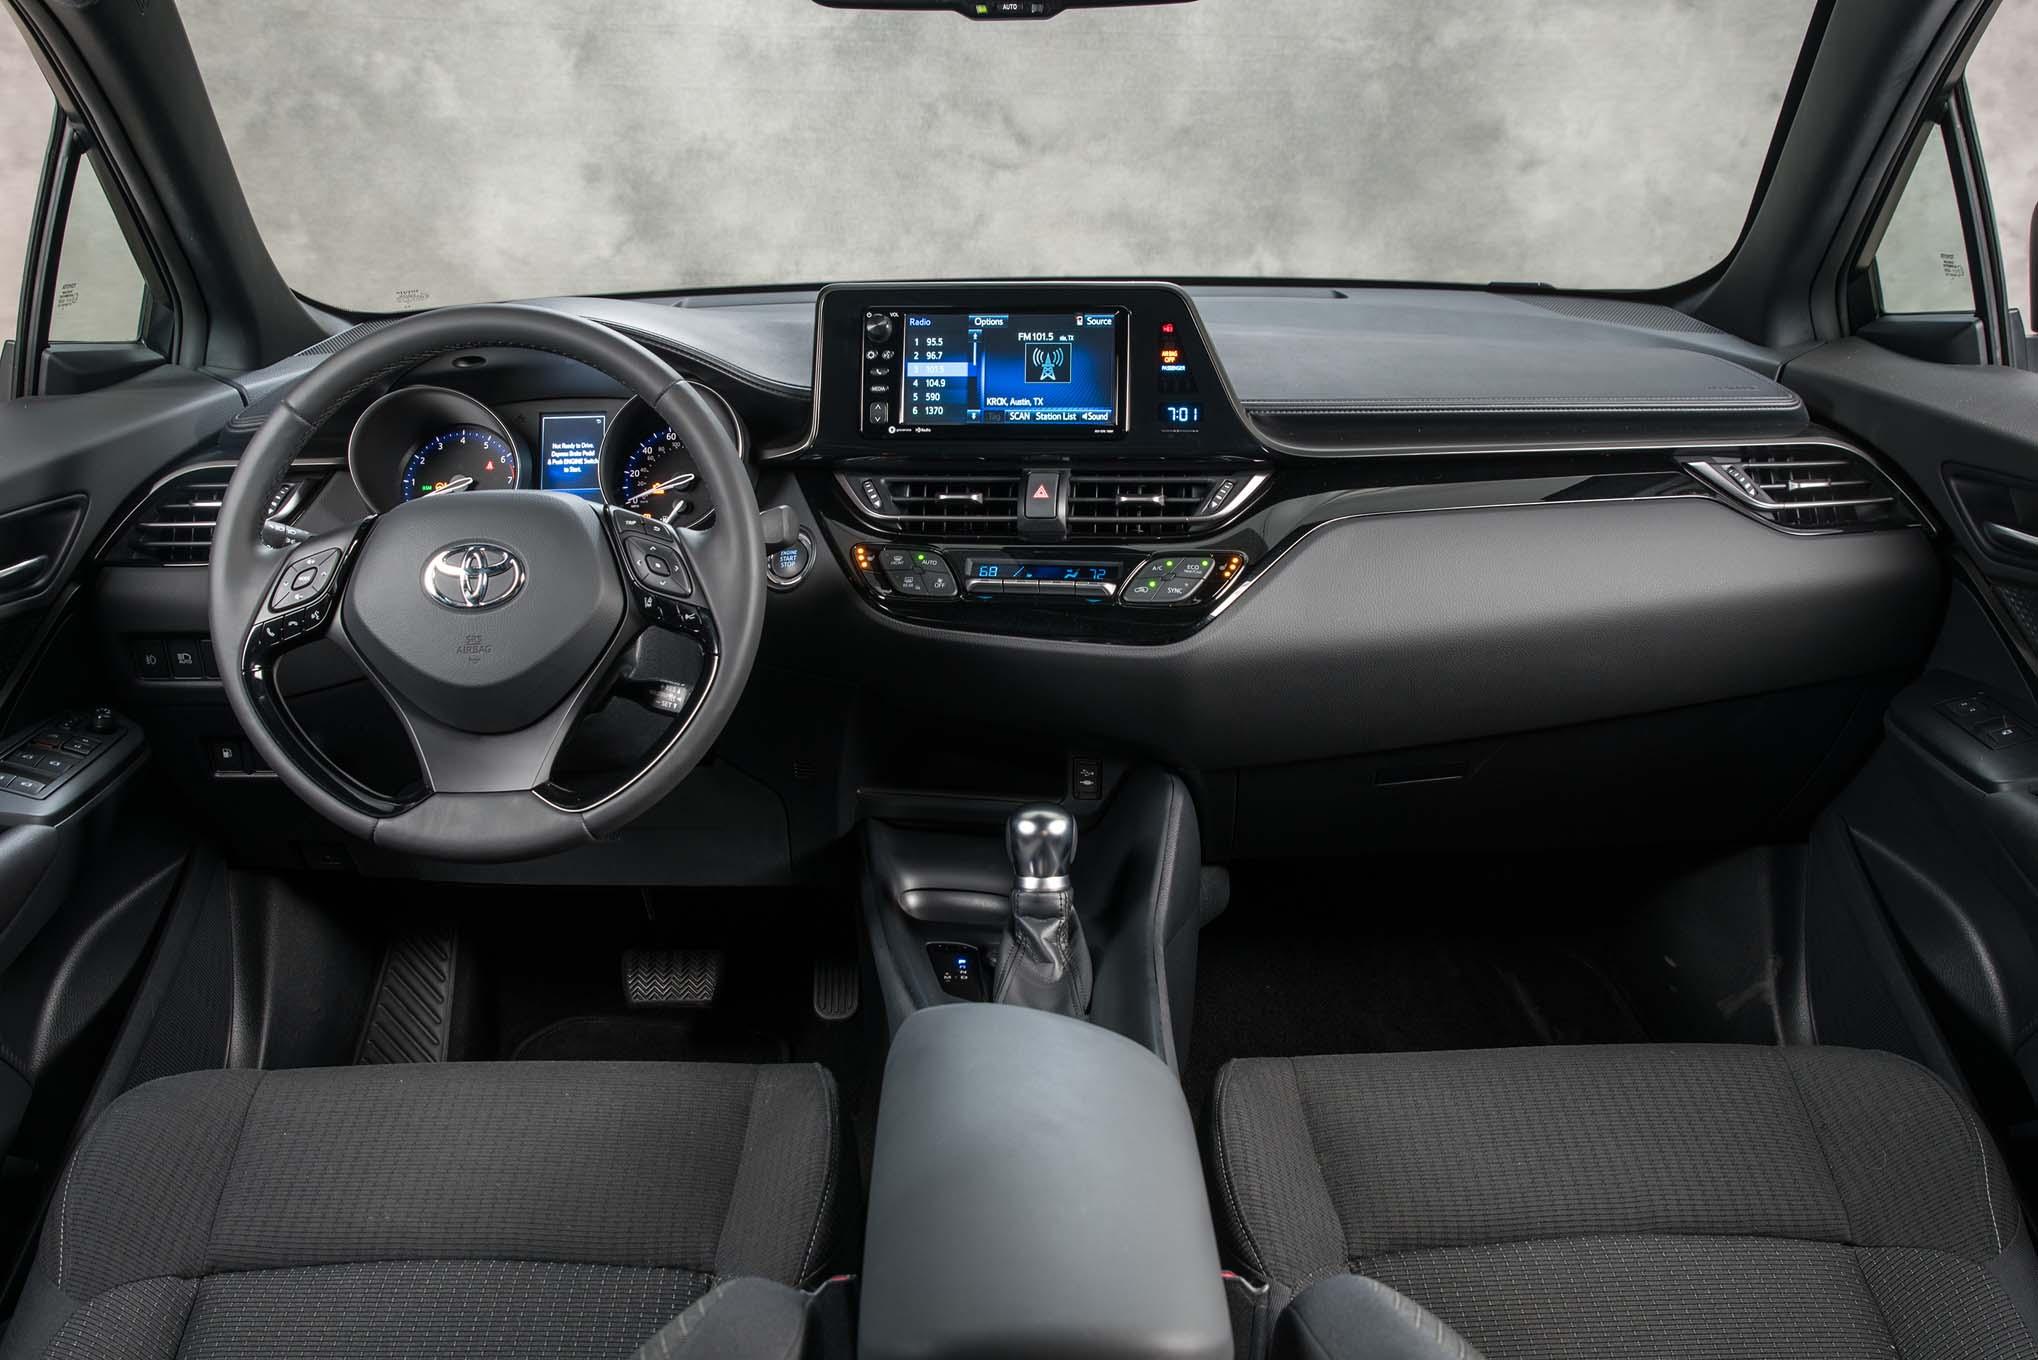 2018 Toyota C HR interior view - Motor Trend en Español